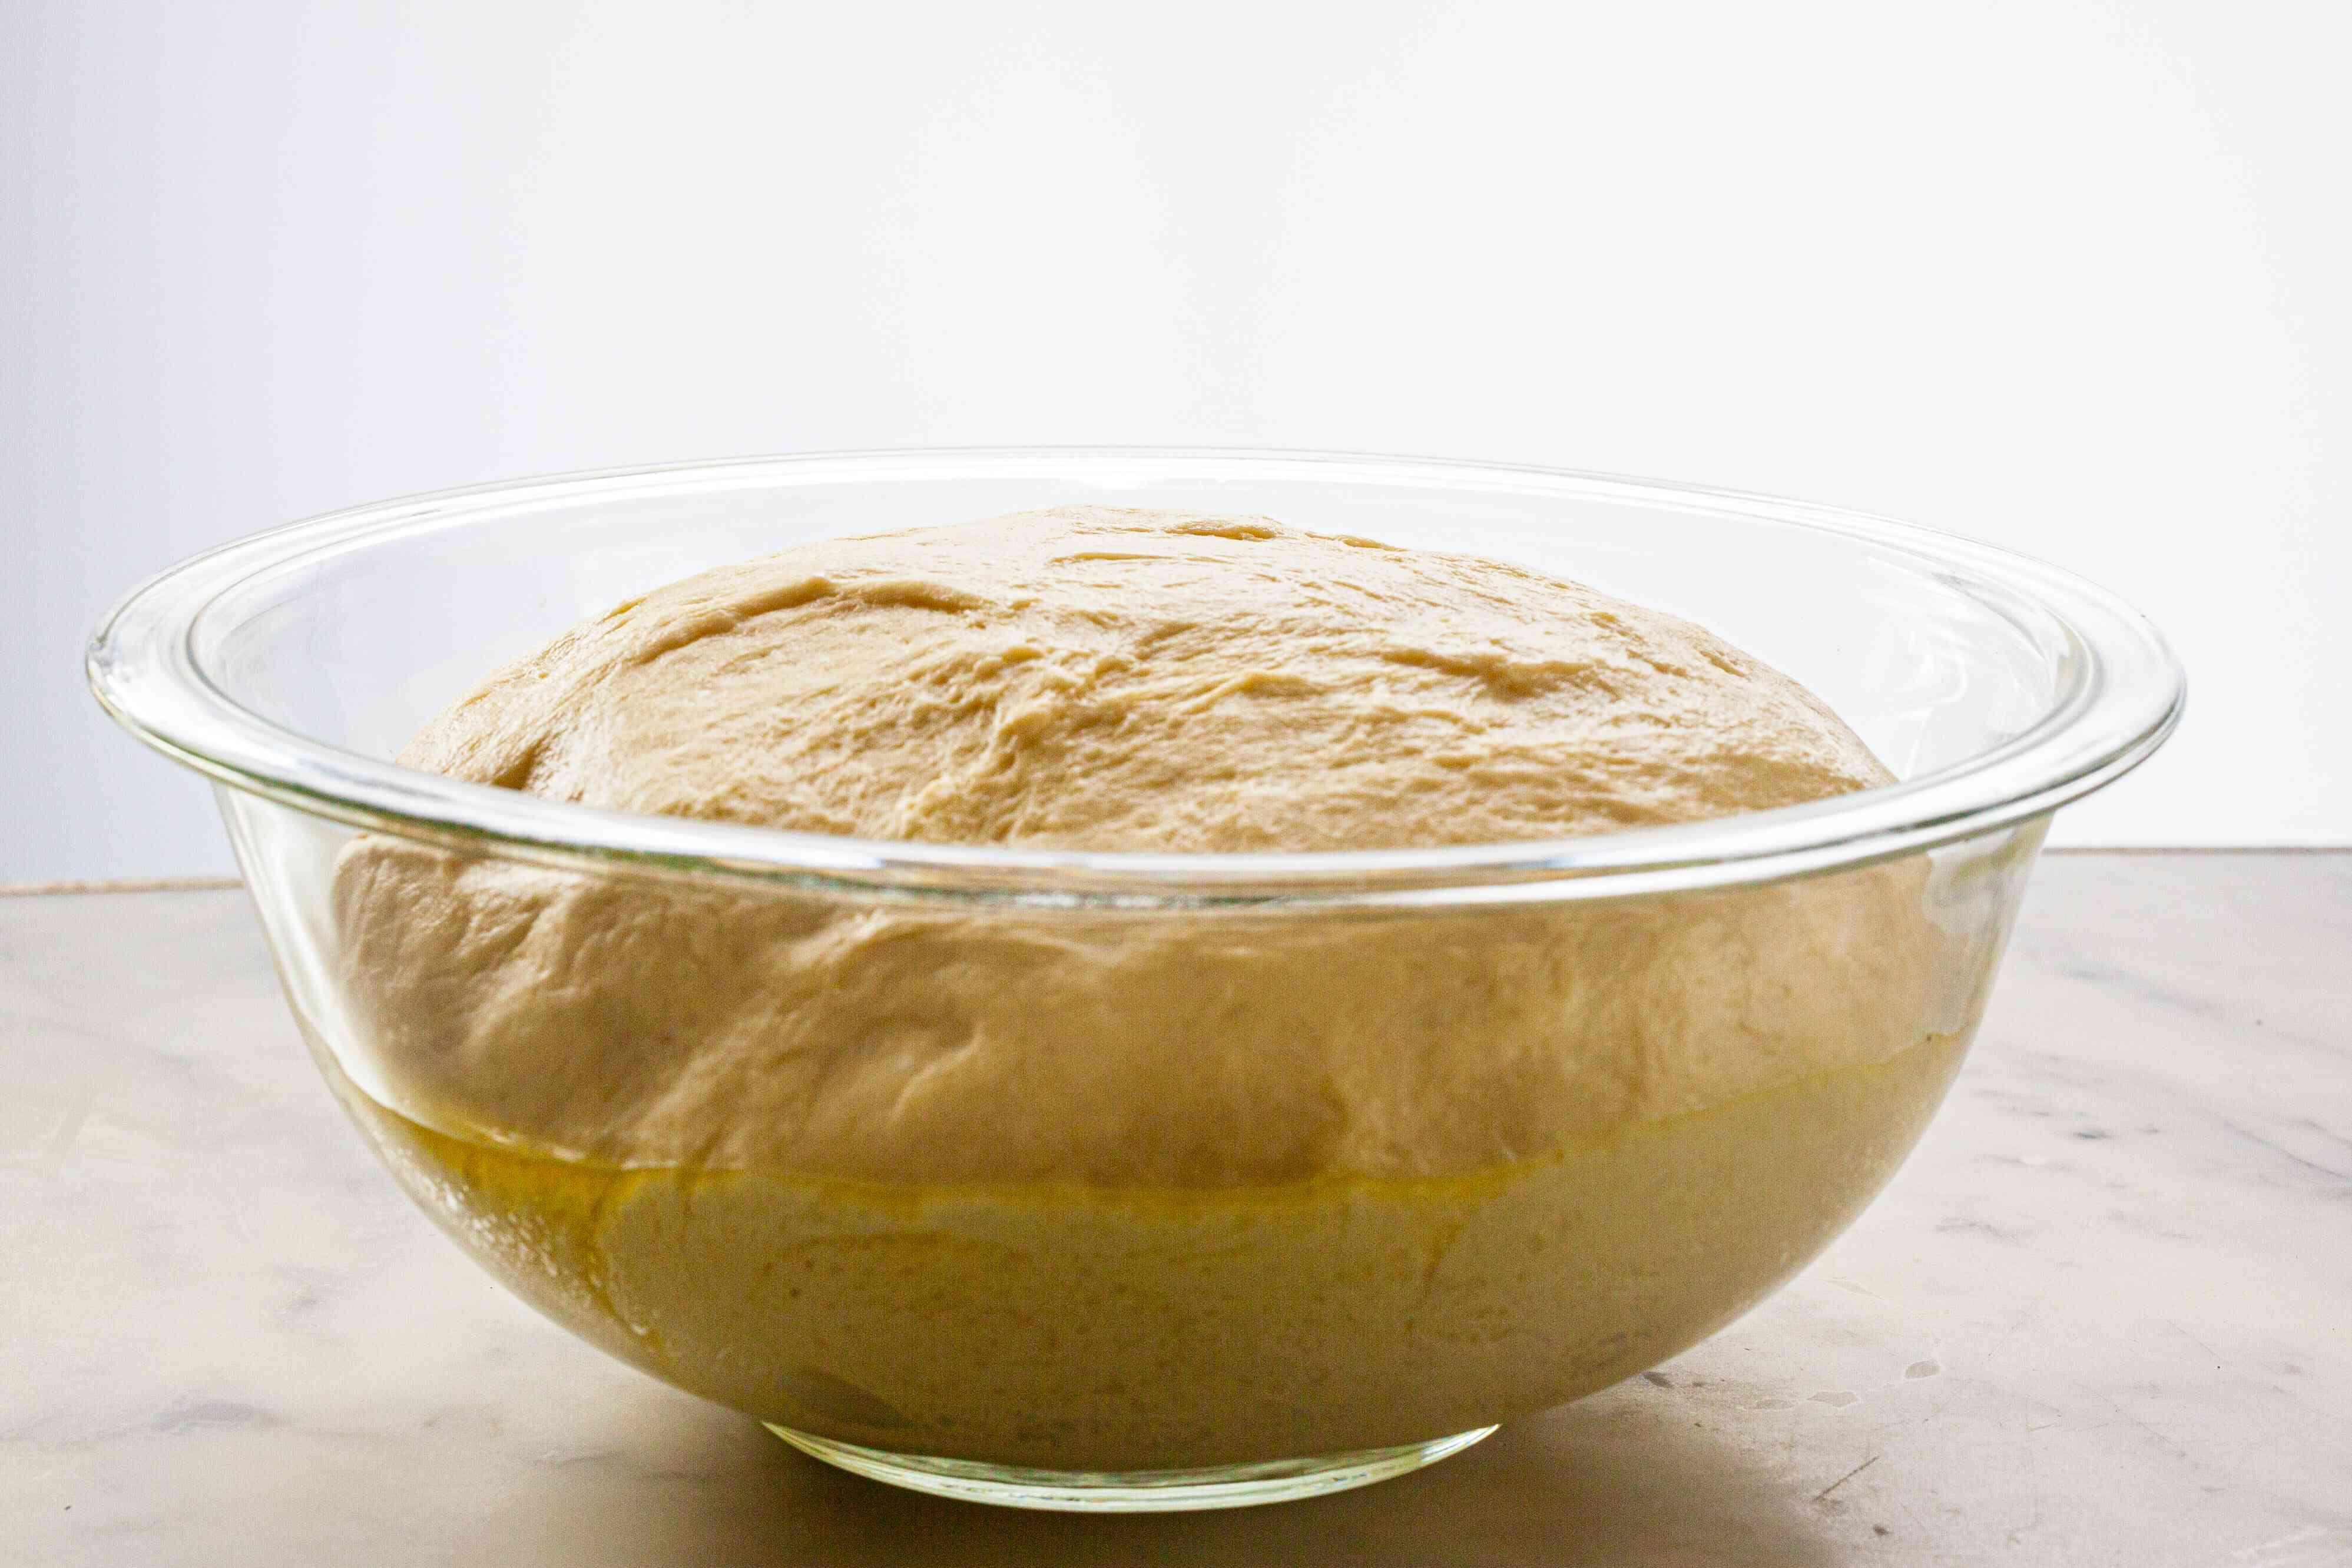 Risen dough to make homemade hamburger buns.